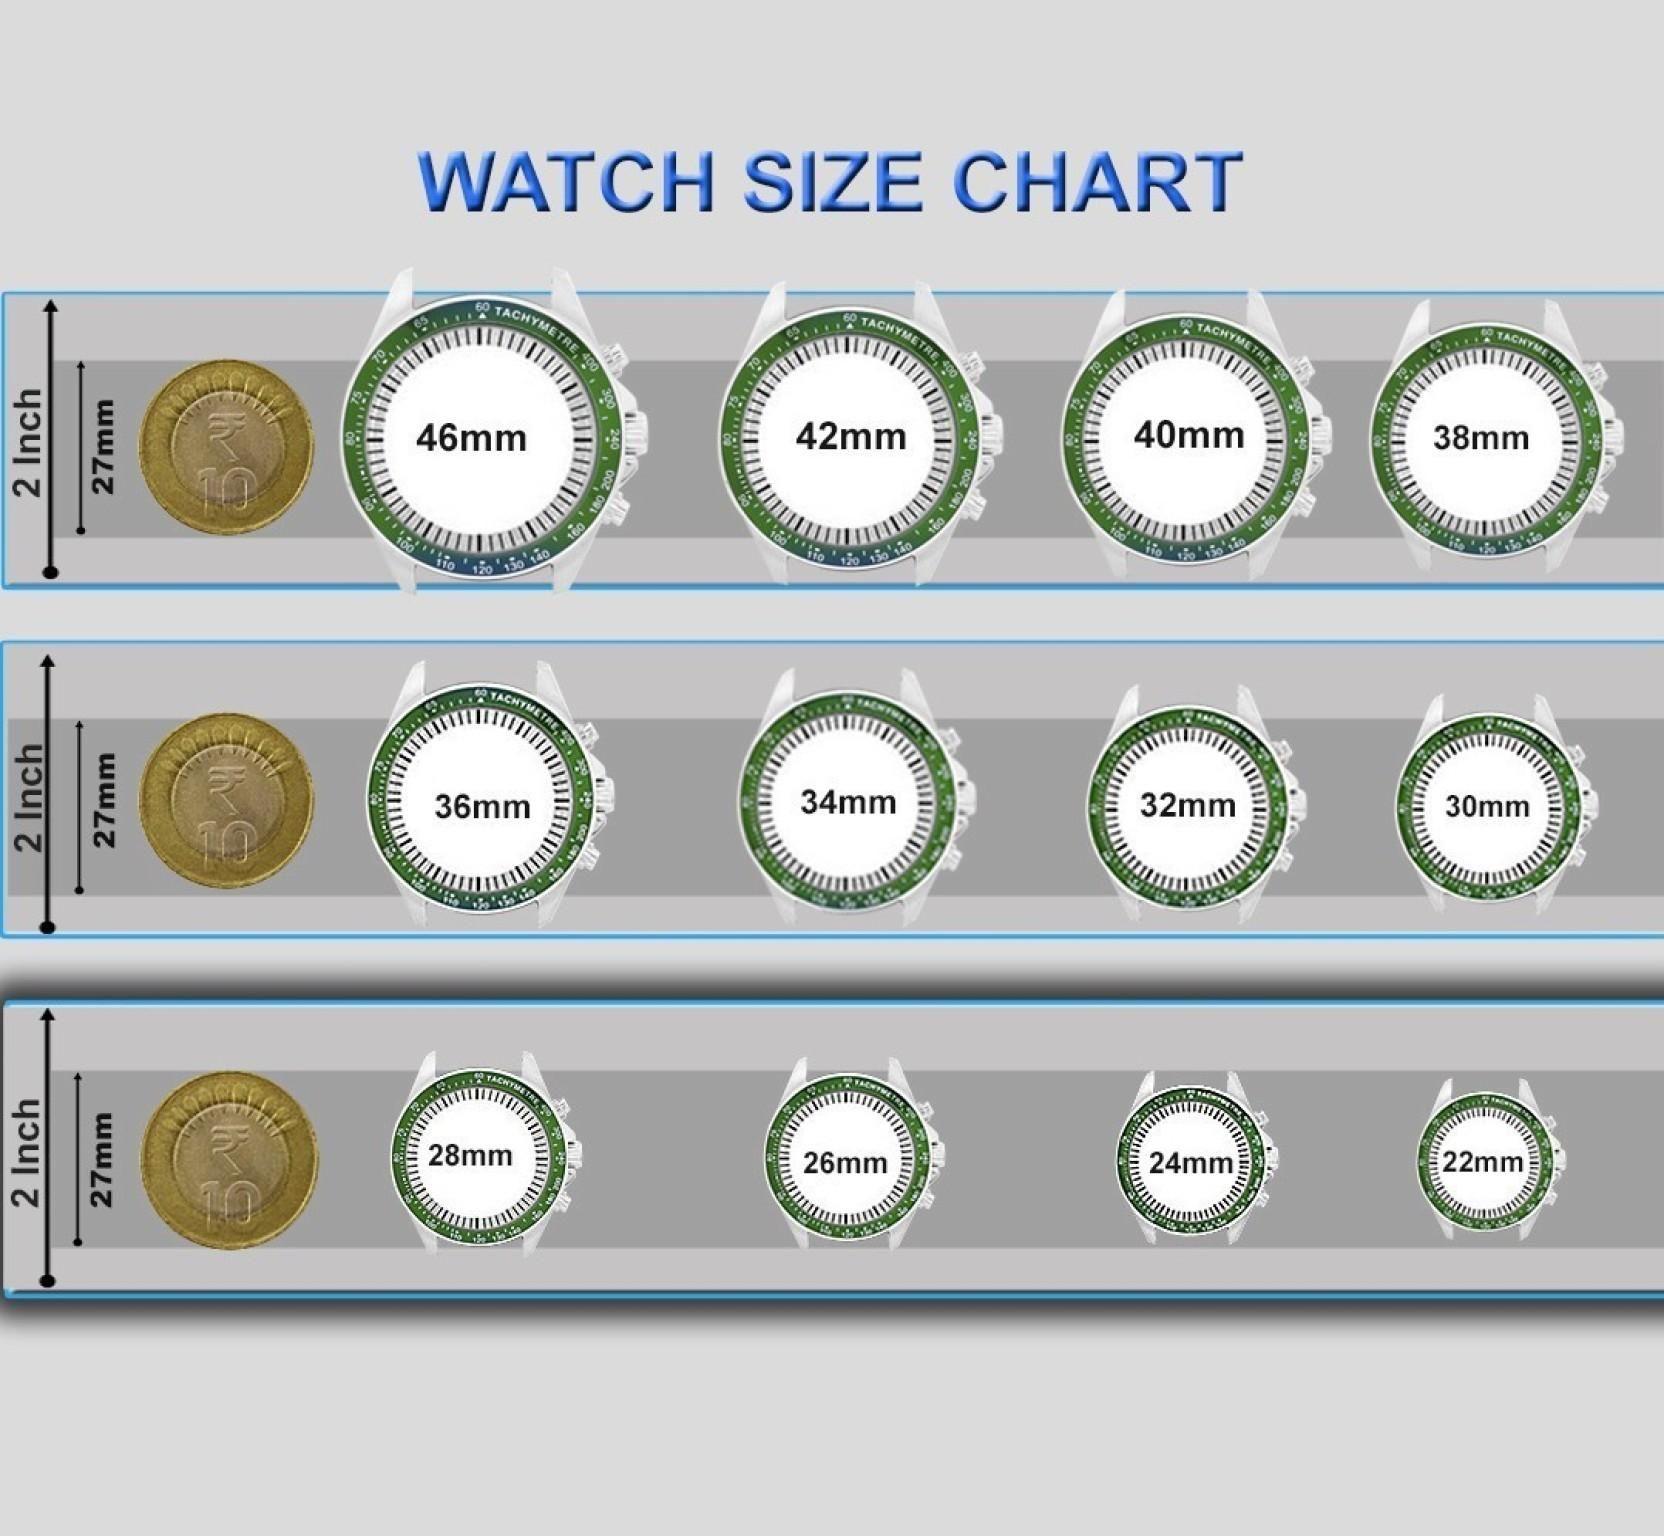 Titan NH9812WM01 Raga Watch - For Women